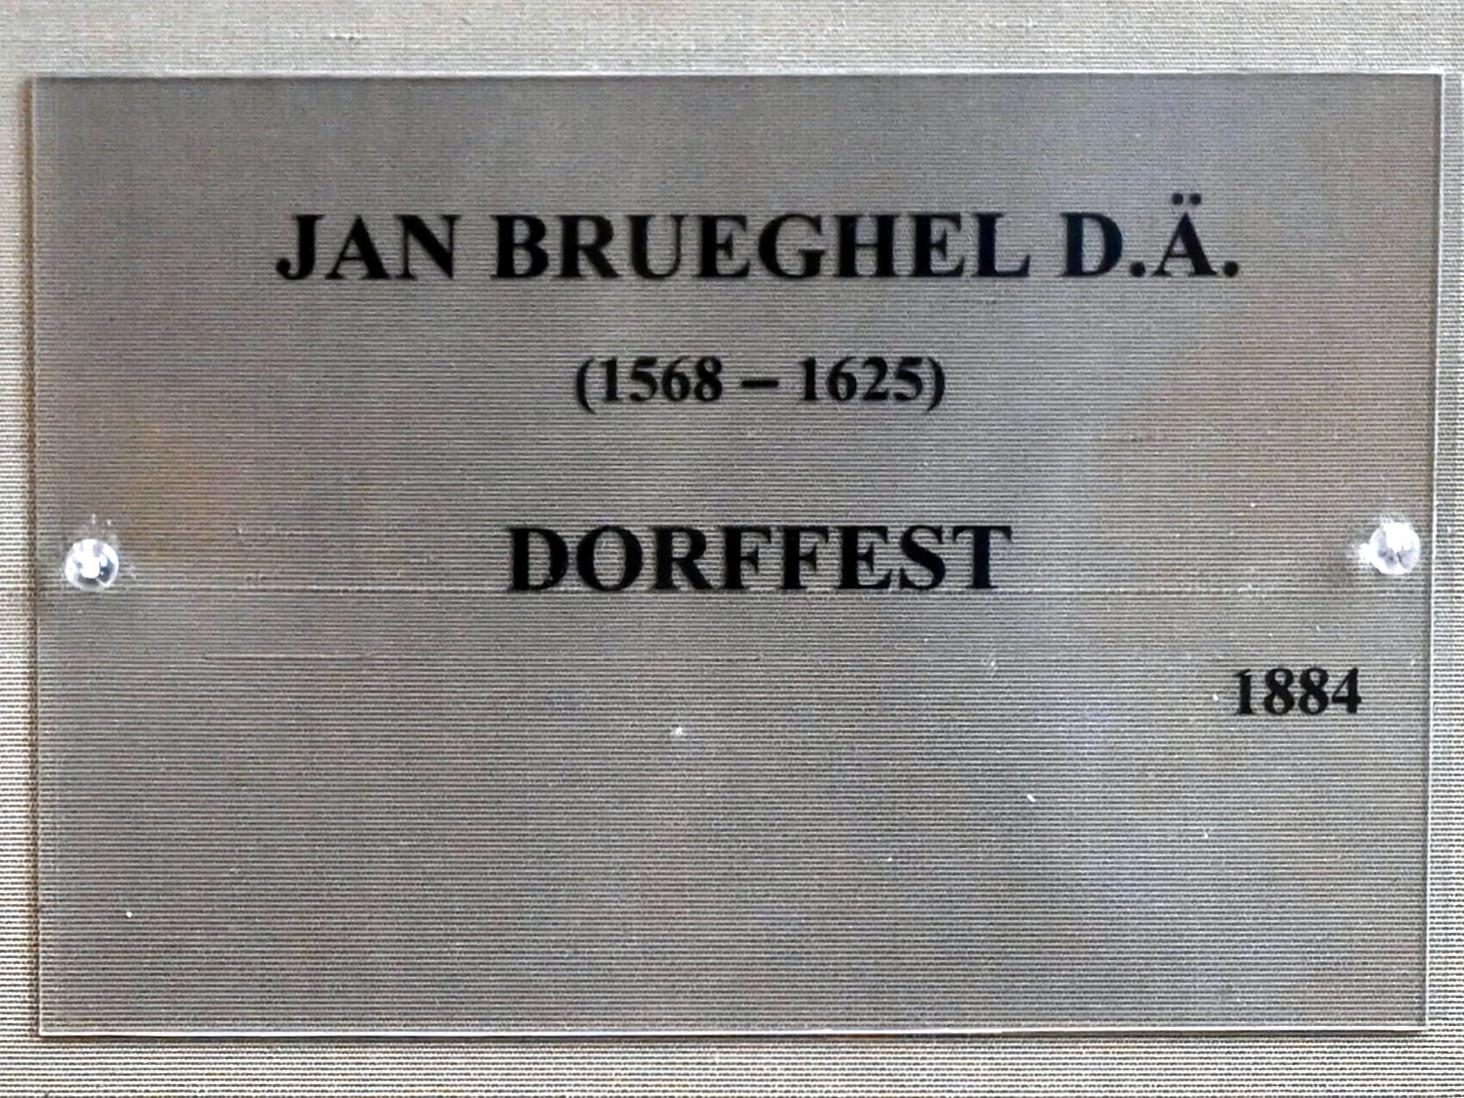 Jan Brueghel der Ältere (Blumenbrueghel): Dorffest, 1612, Bild 2/2